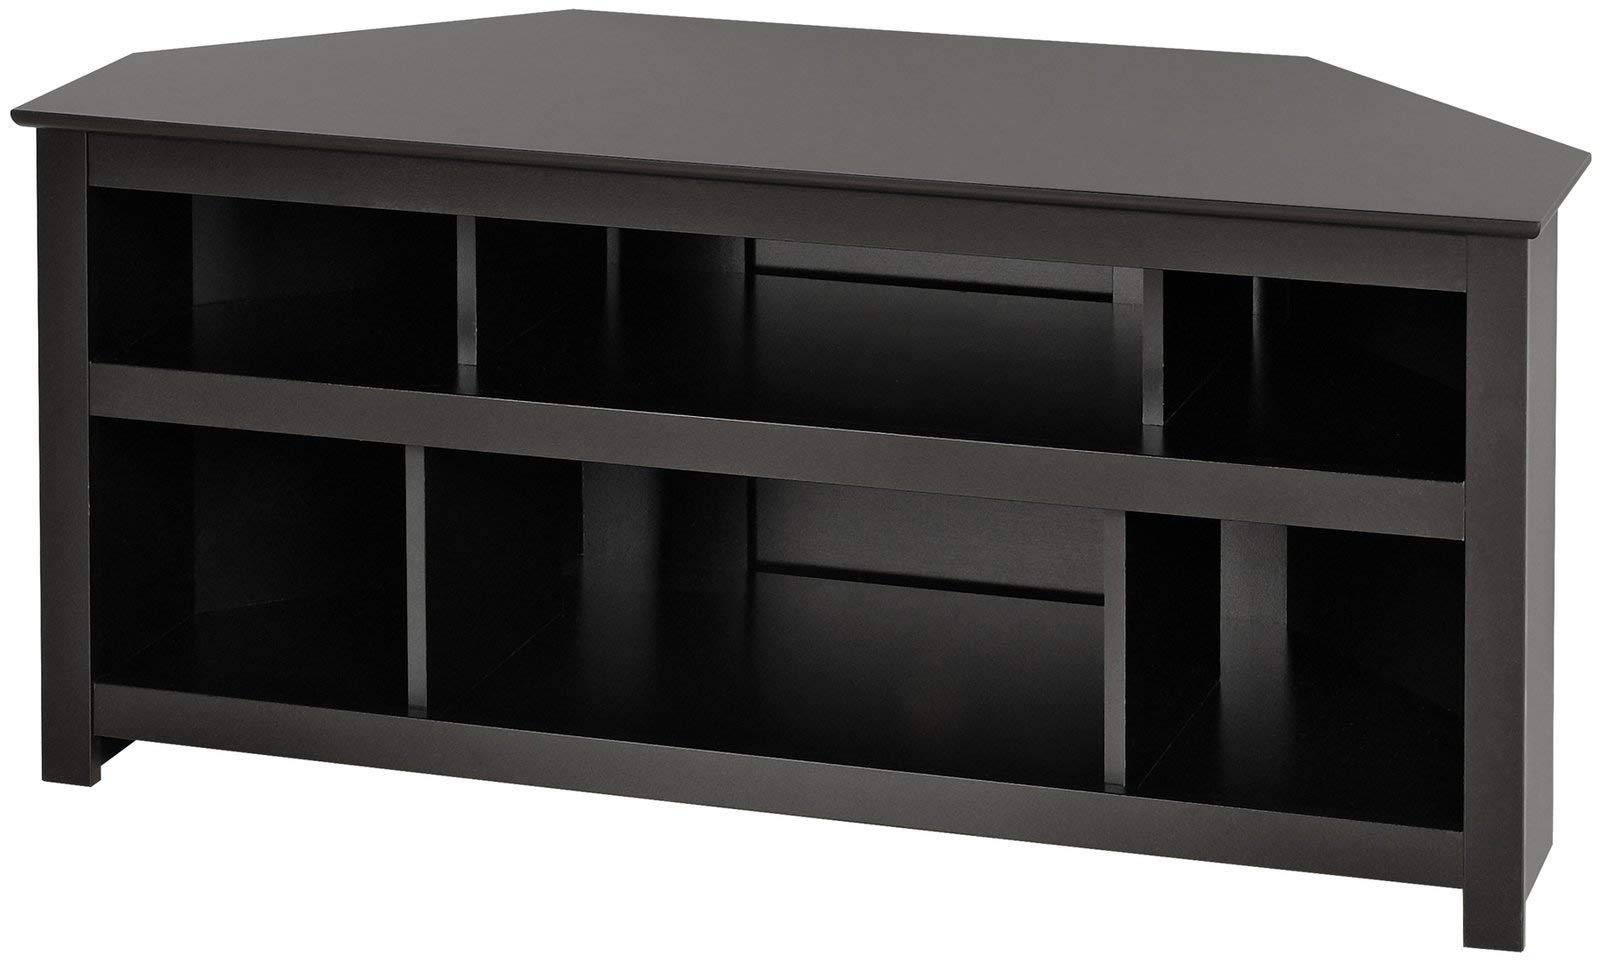 PREPAC Black Vasari Corner Flat Panel Plasma / LCD TV Console